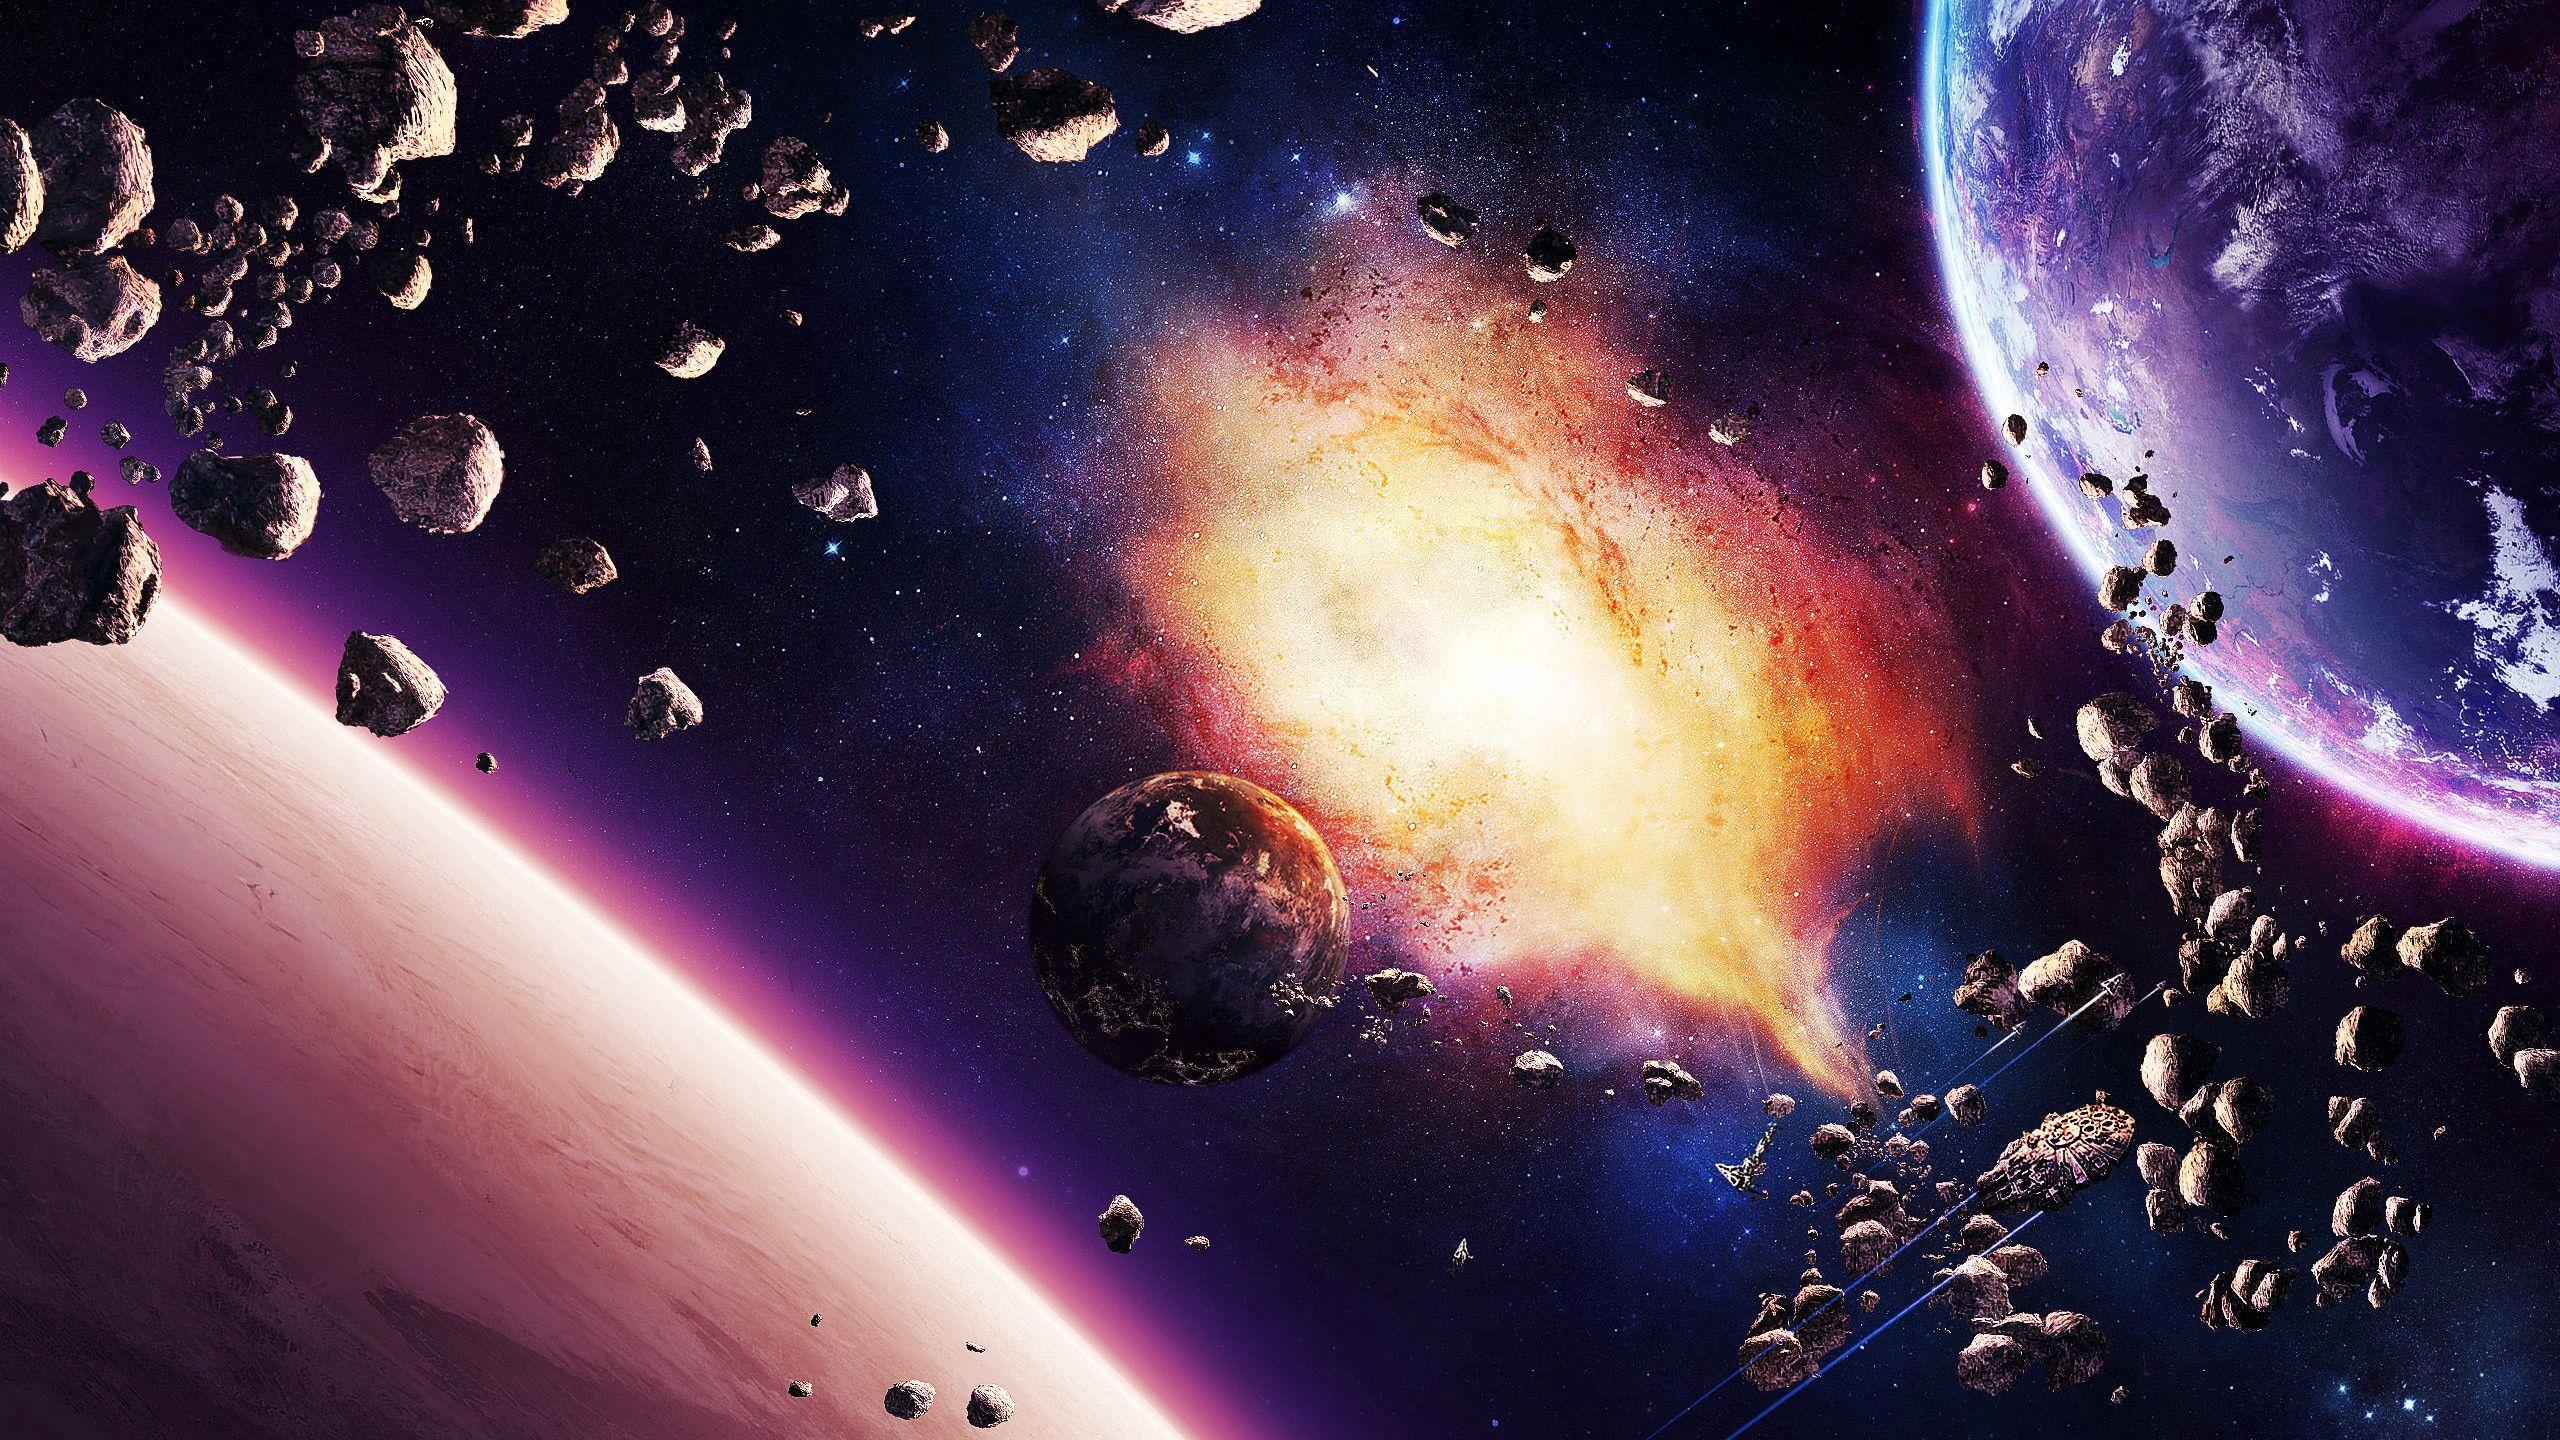 2560x1440 Wallpaper space, planet, explosion, light